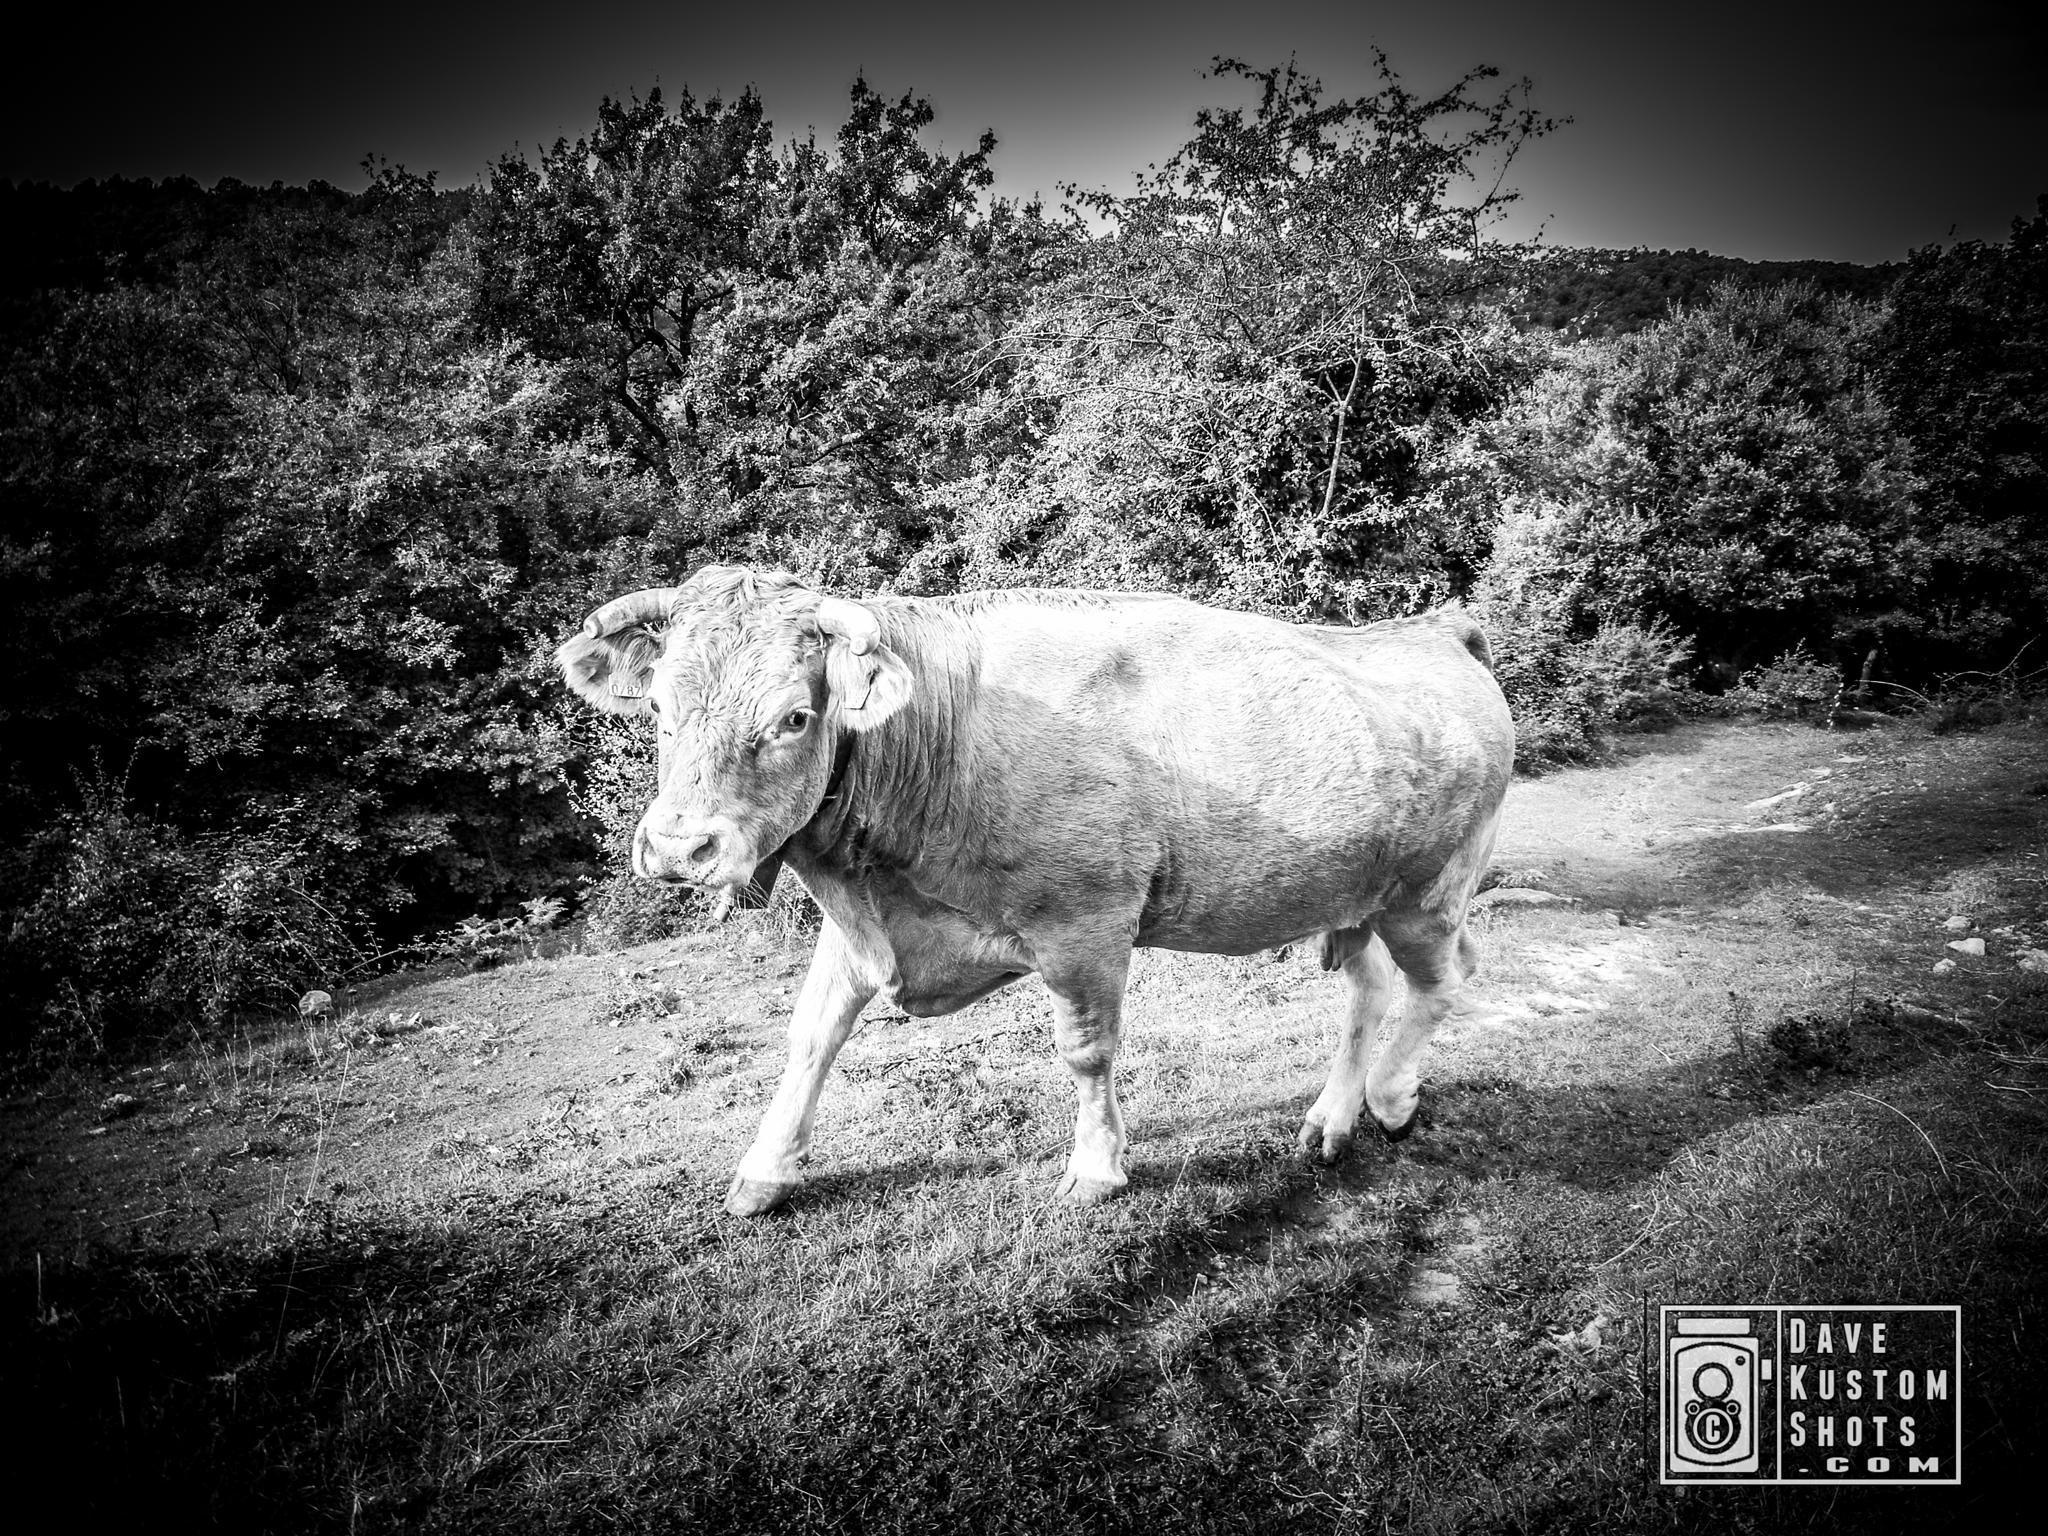 Cow / Vaca by Dave Kustom Shots